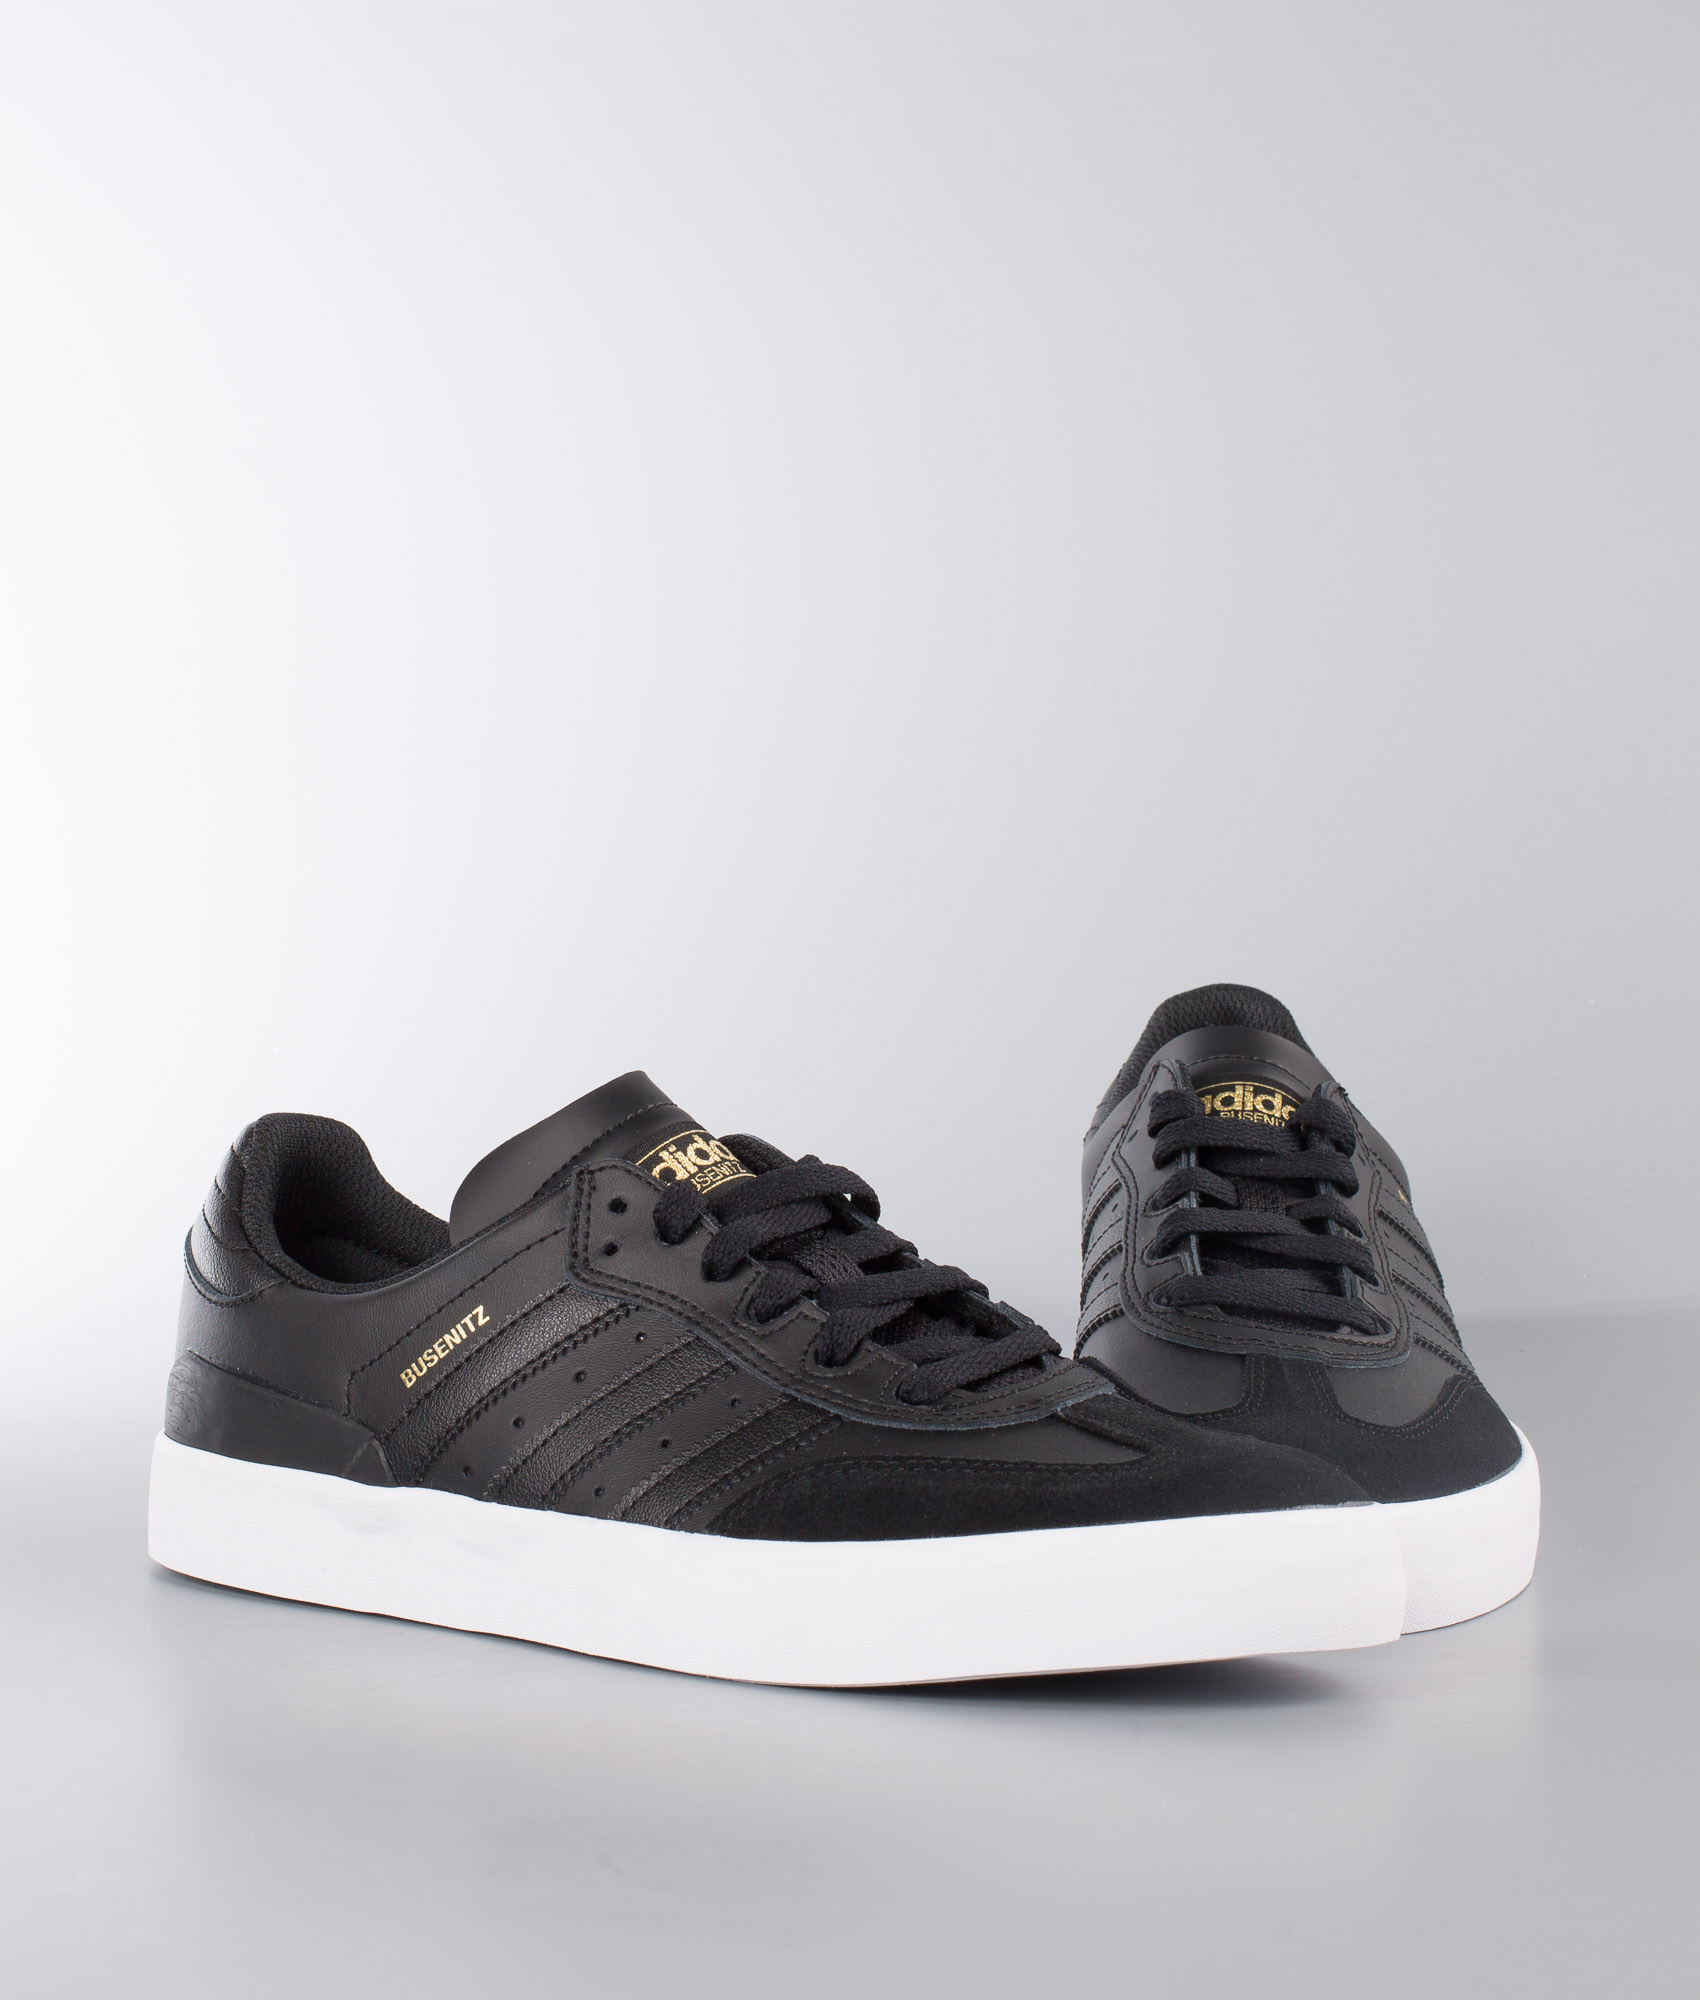 Adidas Skateboarding Busenitz Vulc Rx Schuhe Core BlackCore BlackFtwr White